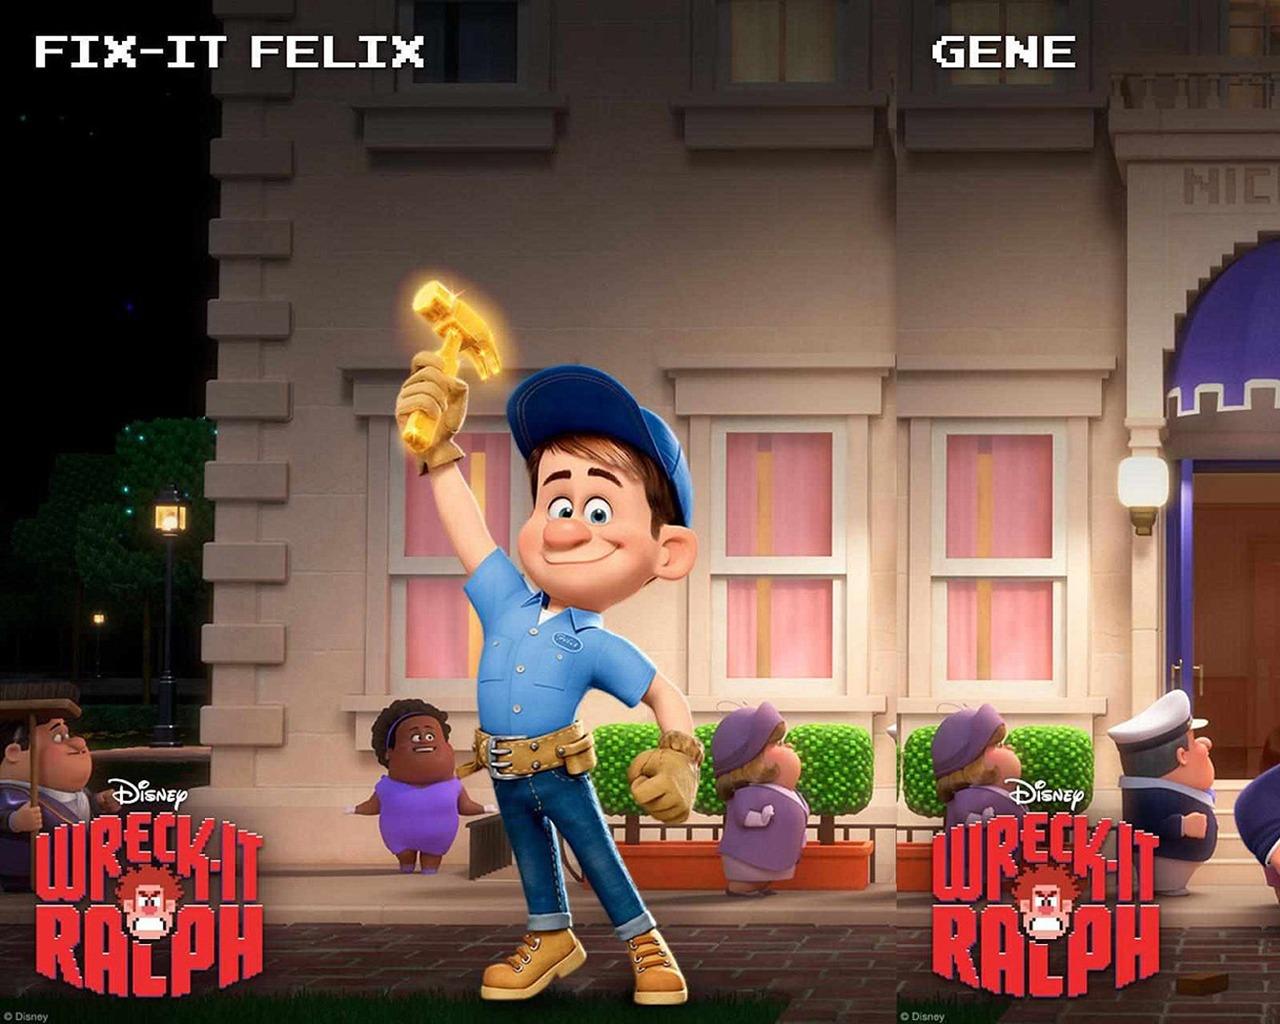 Wreck It Ralph Animation Movie 4k Hd Desktop Wallpaper For: Wreck-It Ralph Movie HD Desktop Wallpapers 01 Preview